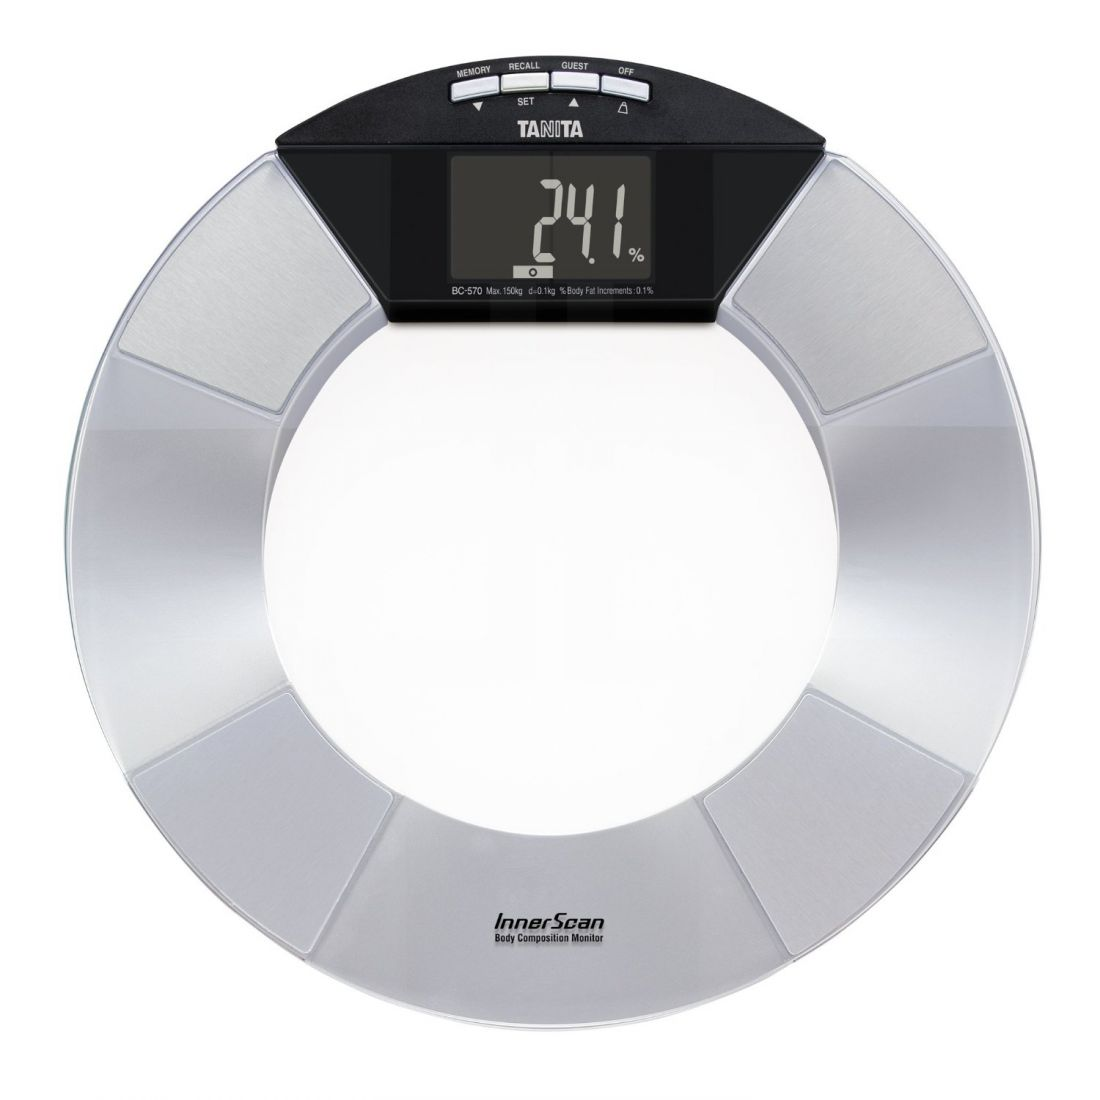 Весы-анализаторы Tanita BC570